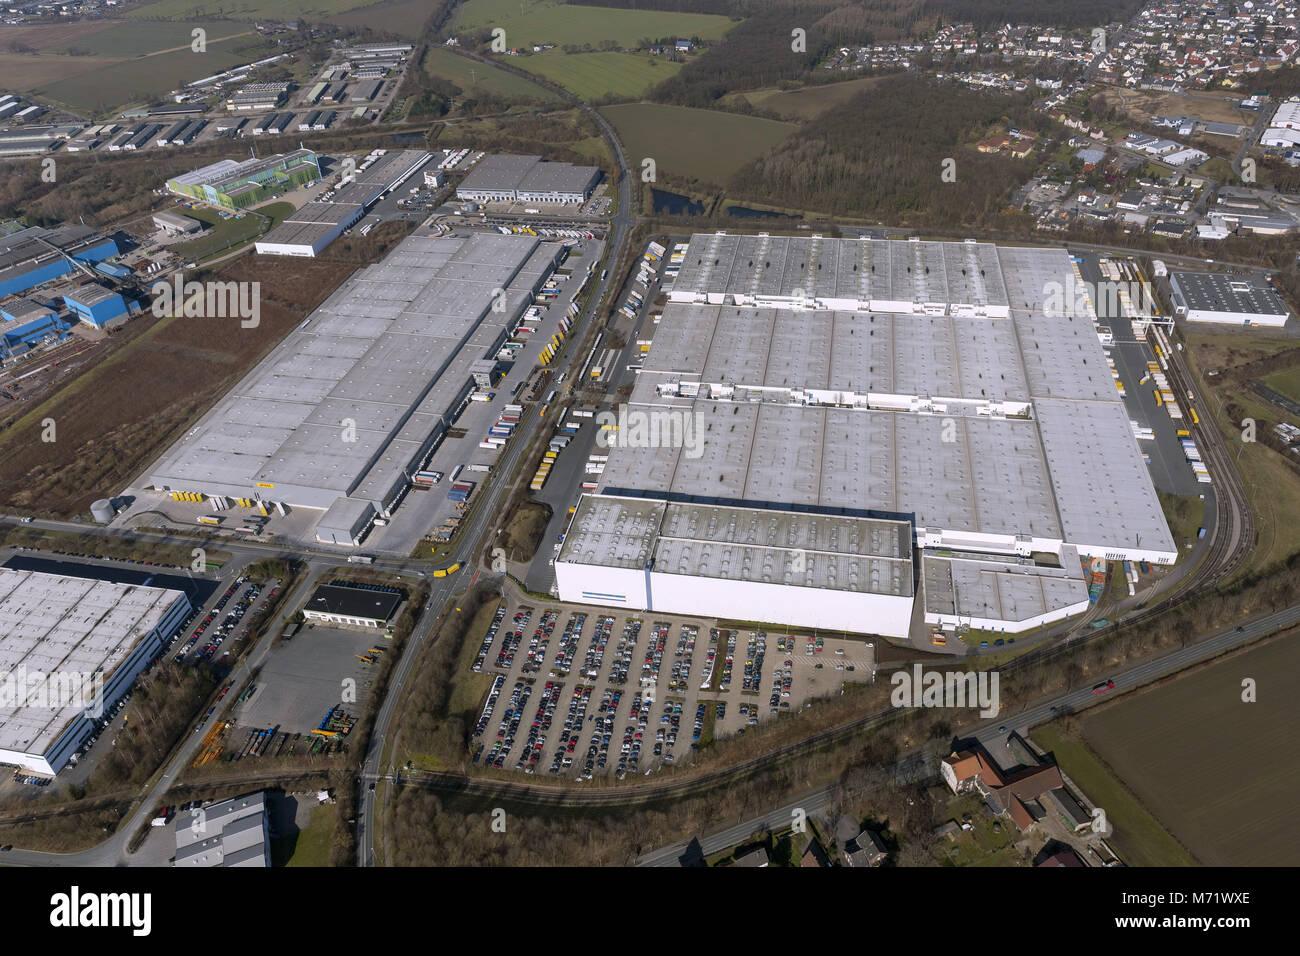 Luftbild, DHL Solutions Retail GmbH, logistics companies, warehouses, Königsborn, Unna, Ruhr area, North Rhine - Stock Image